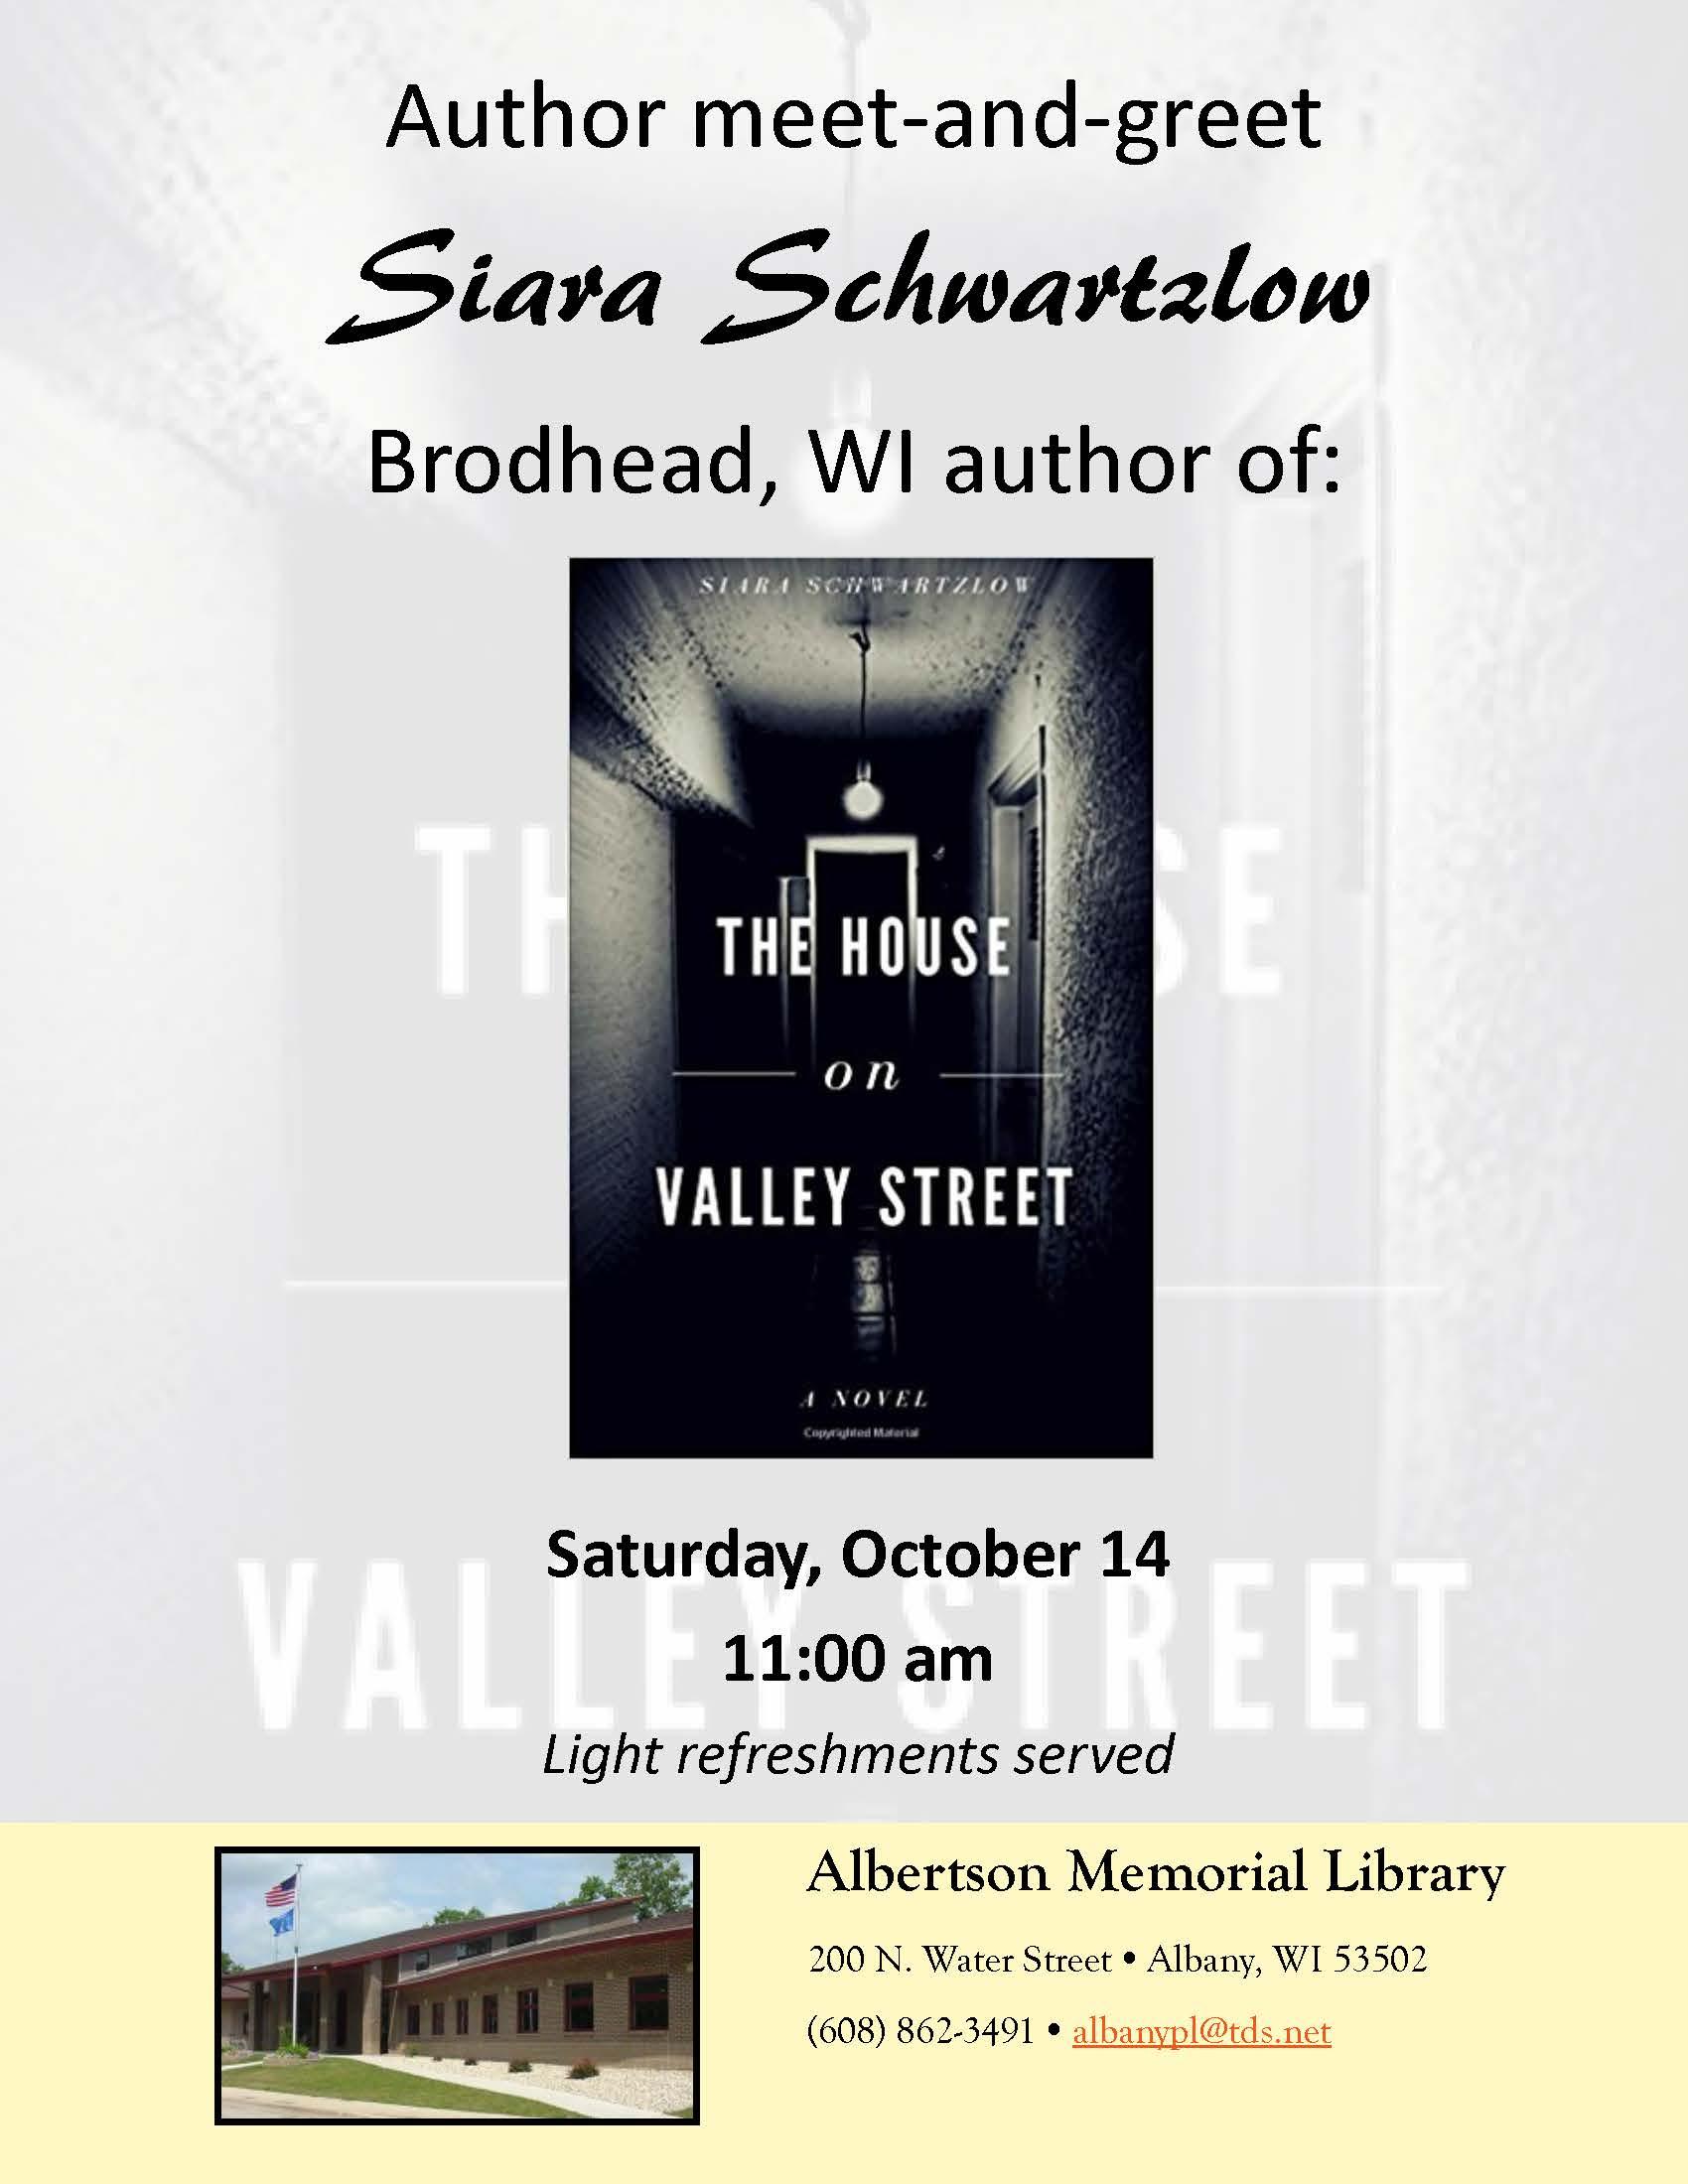 Siara schwartzlow author meet and greet albertson memorial library siara schwartzlow author meet and greet m4hsunfo